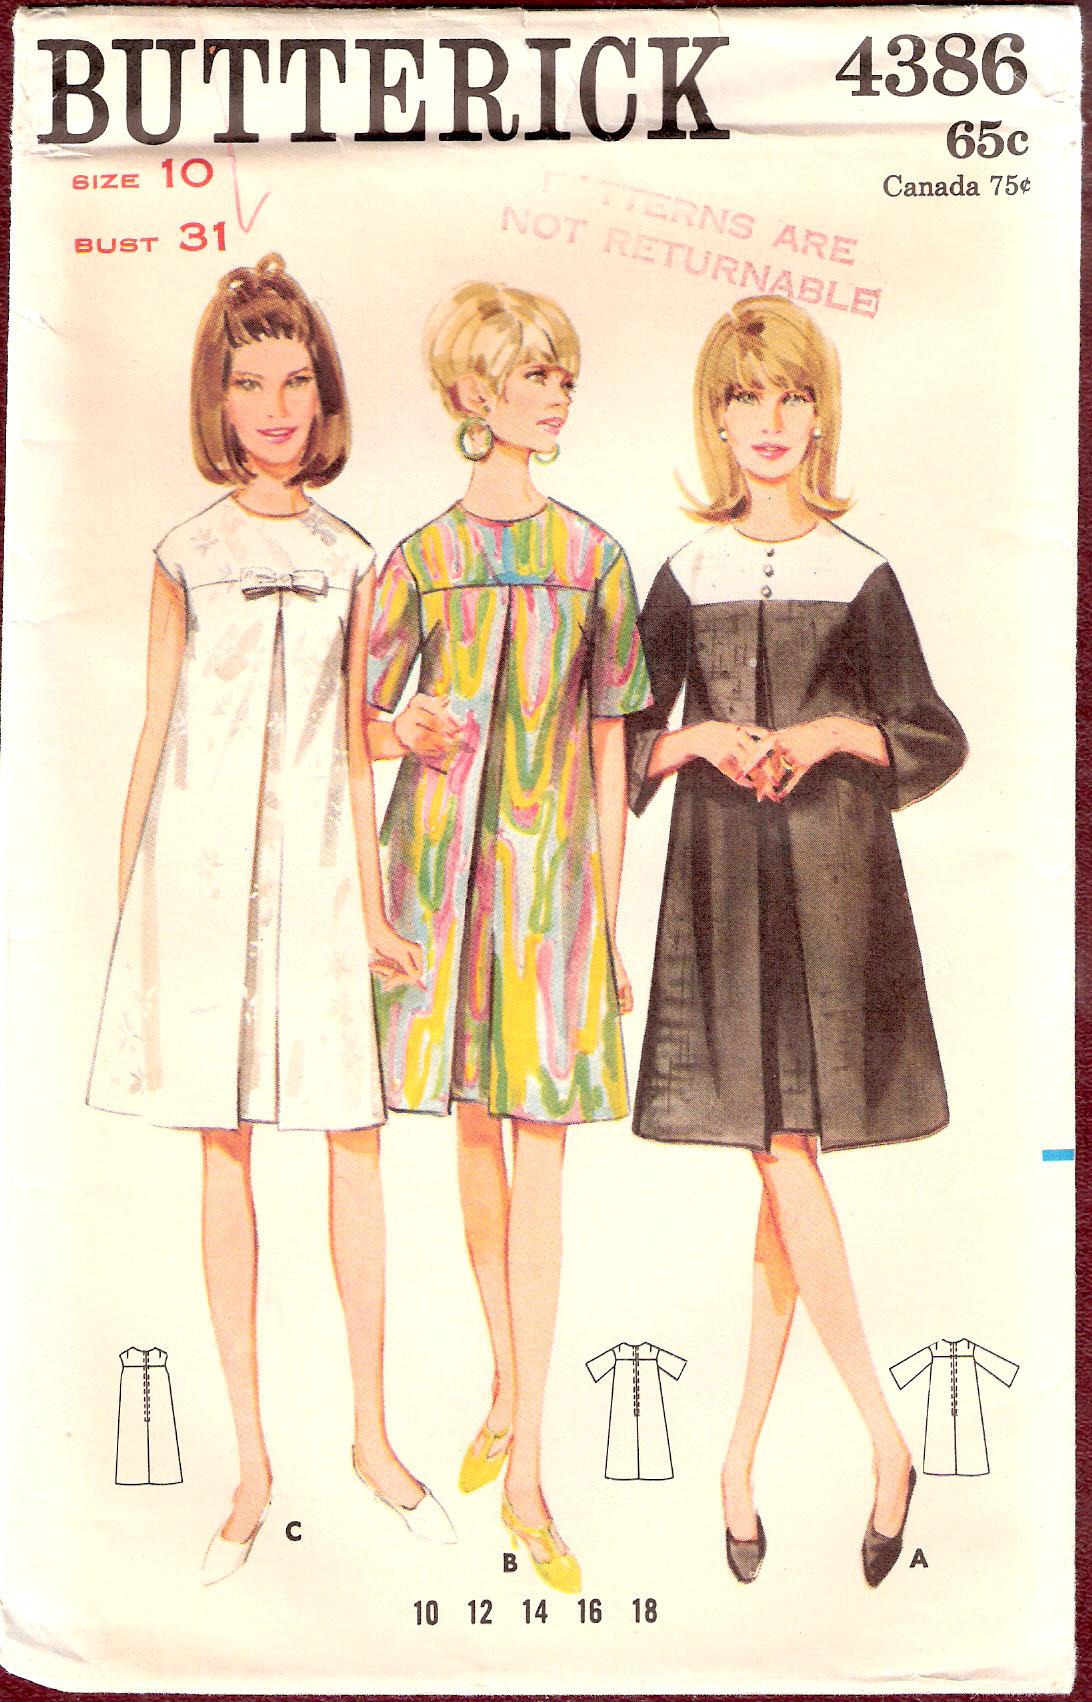 butterick 4386 vintage sewing patterns fandom powered